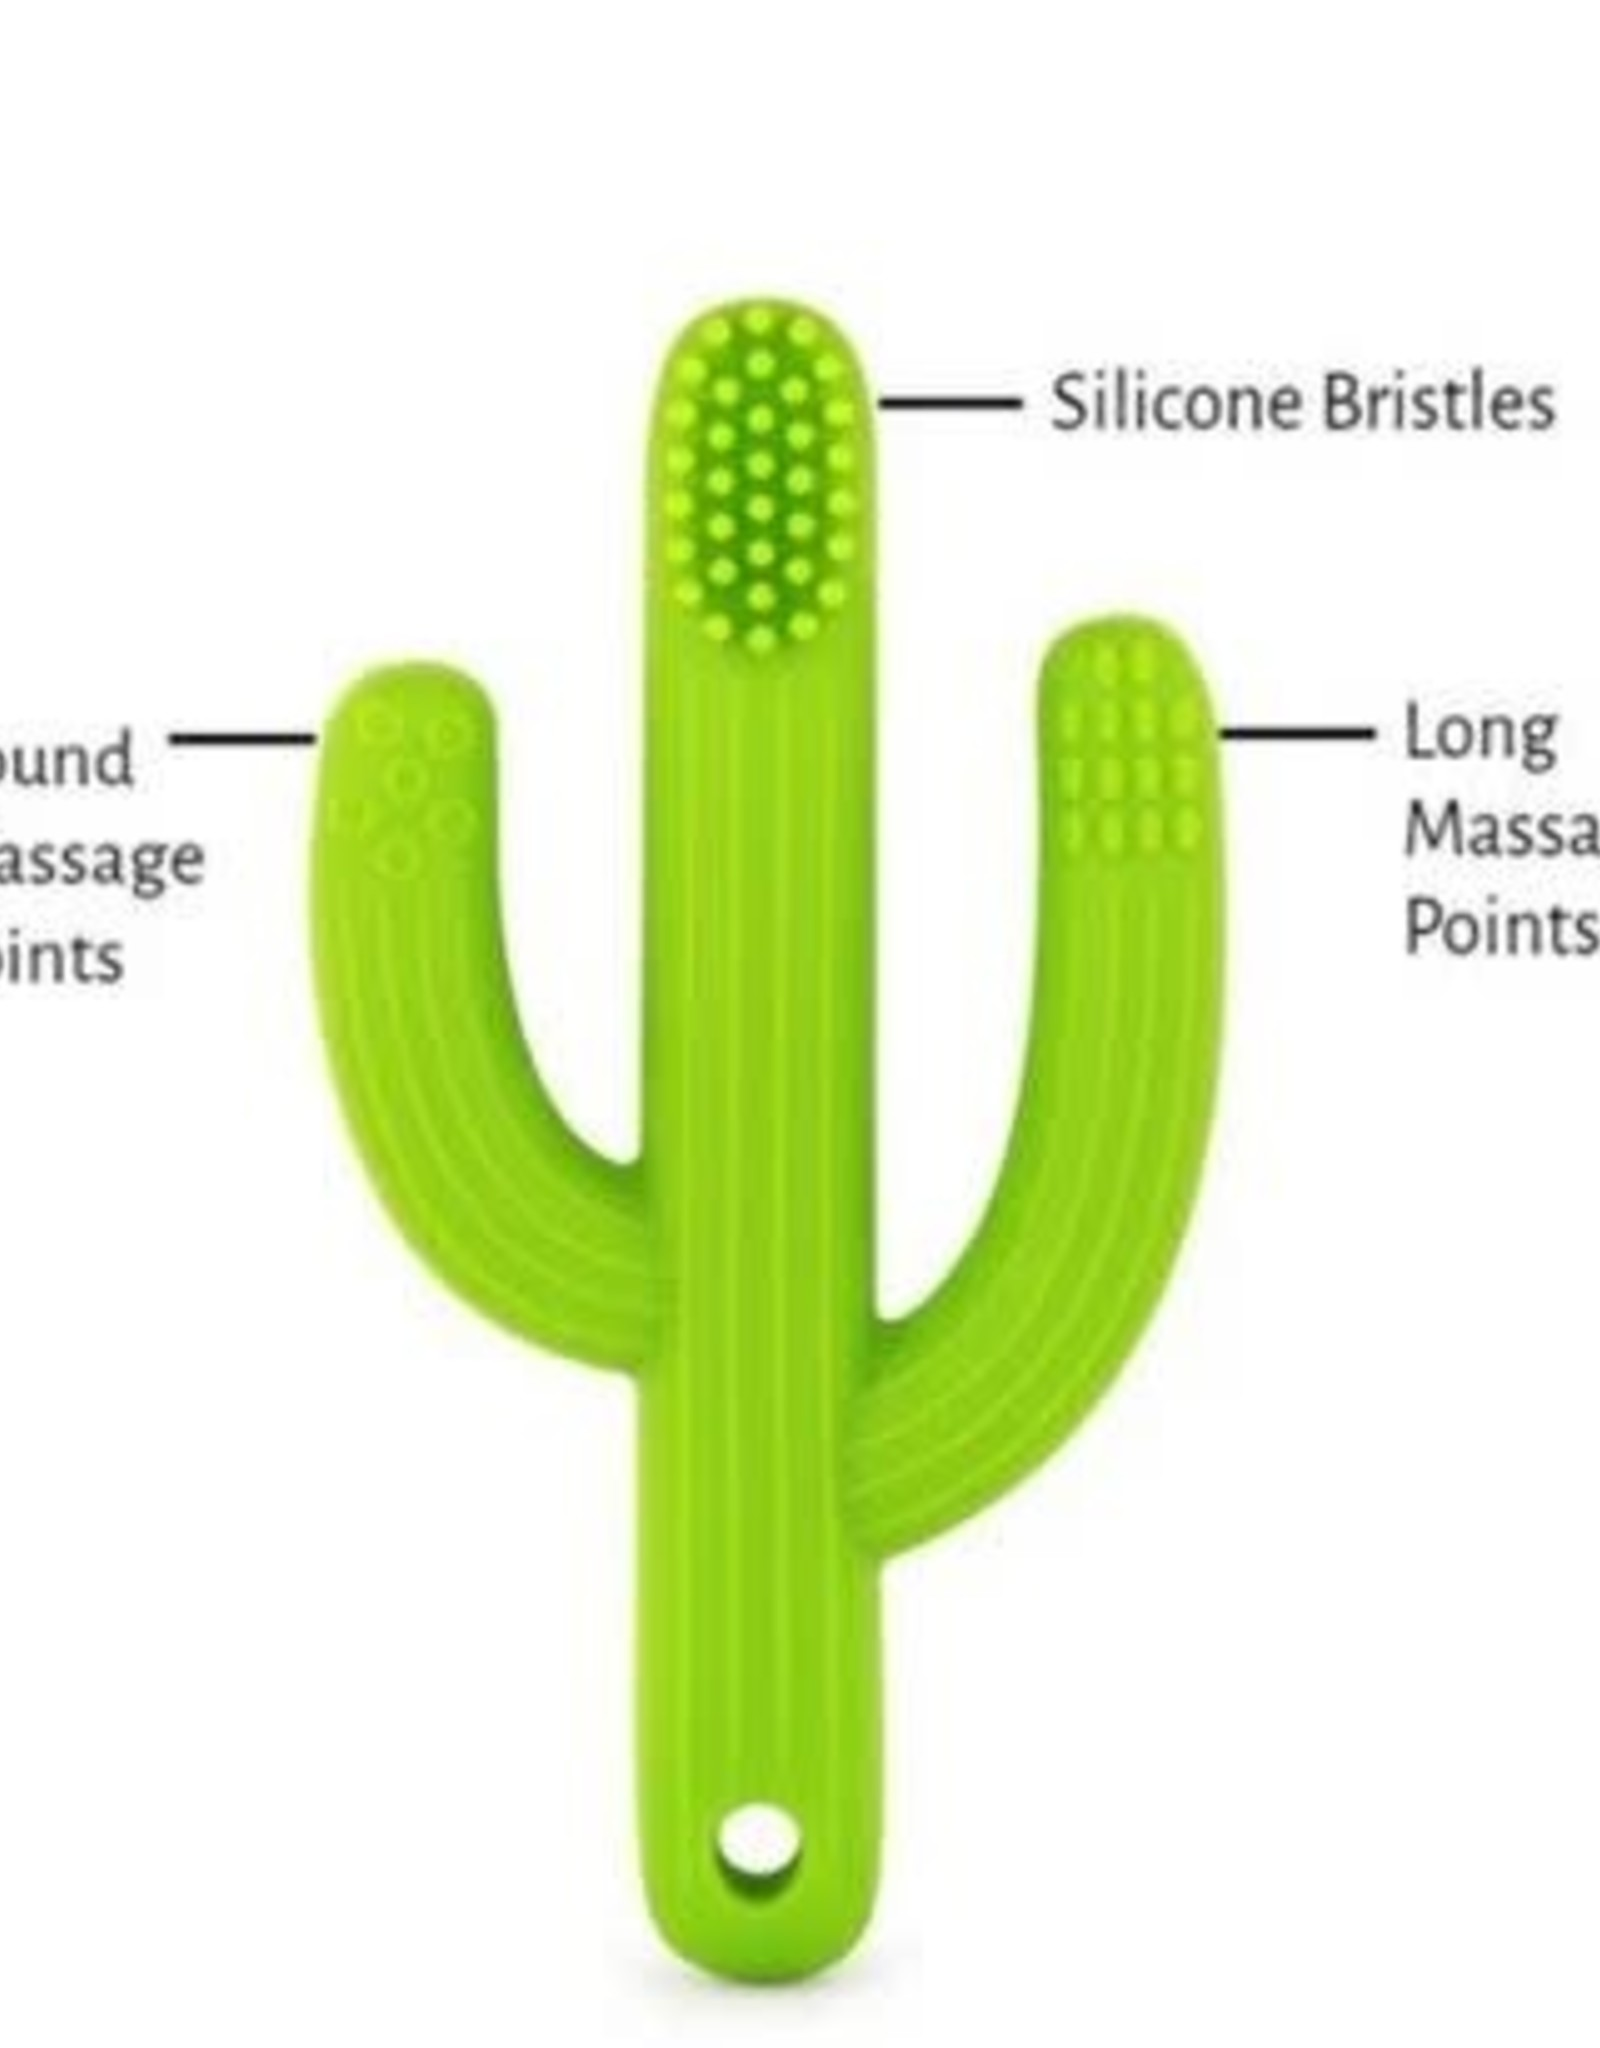 The Pencil Grip Cactus Training Toothbrush